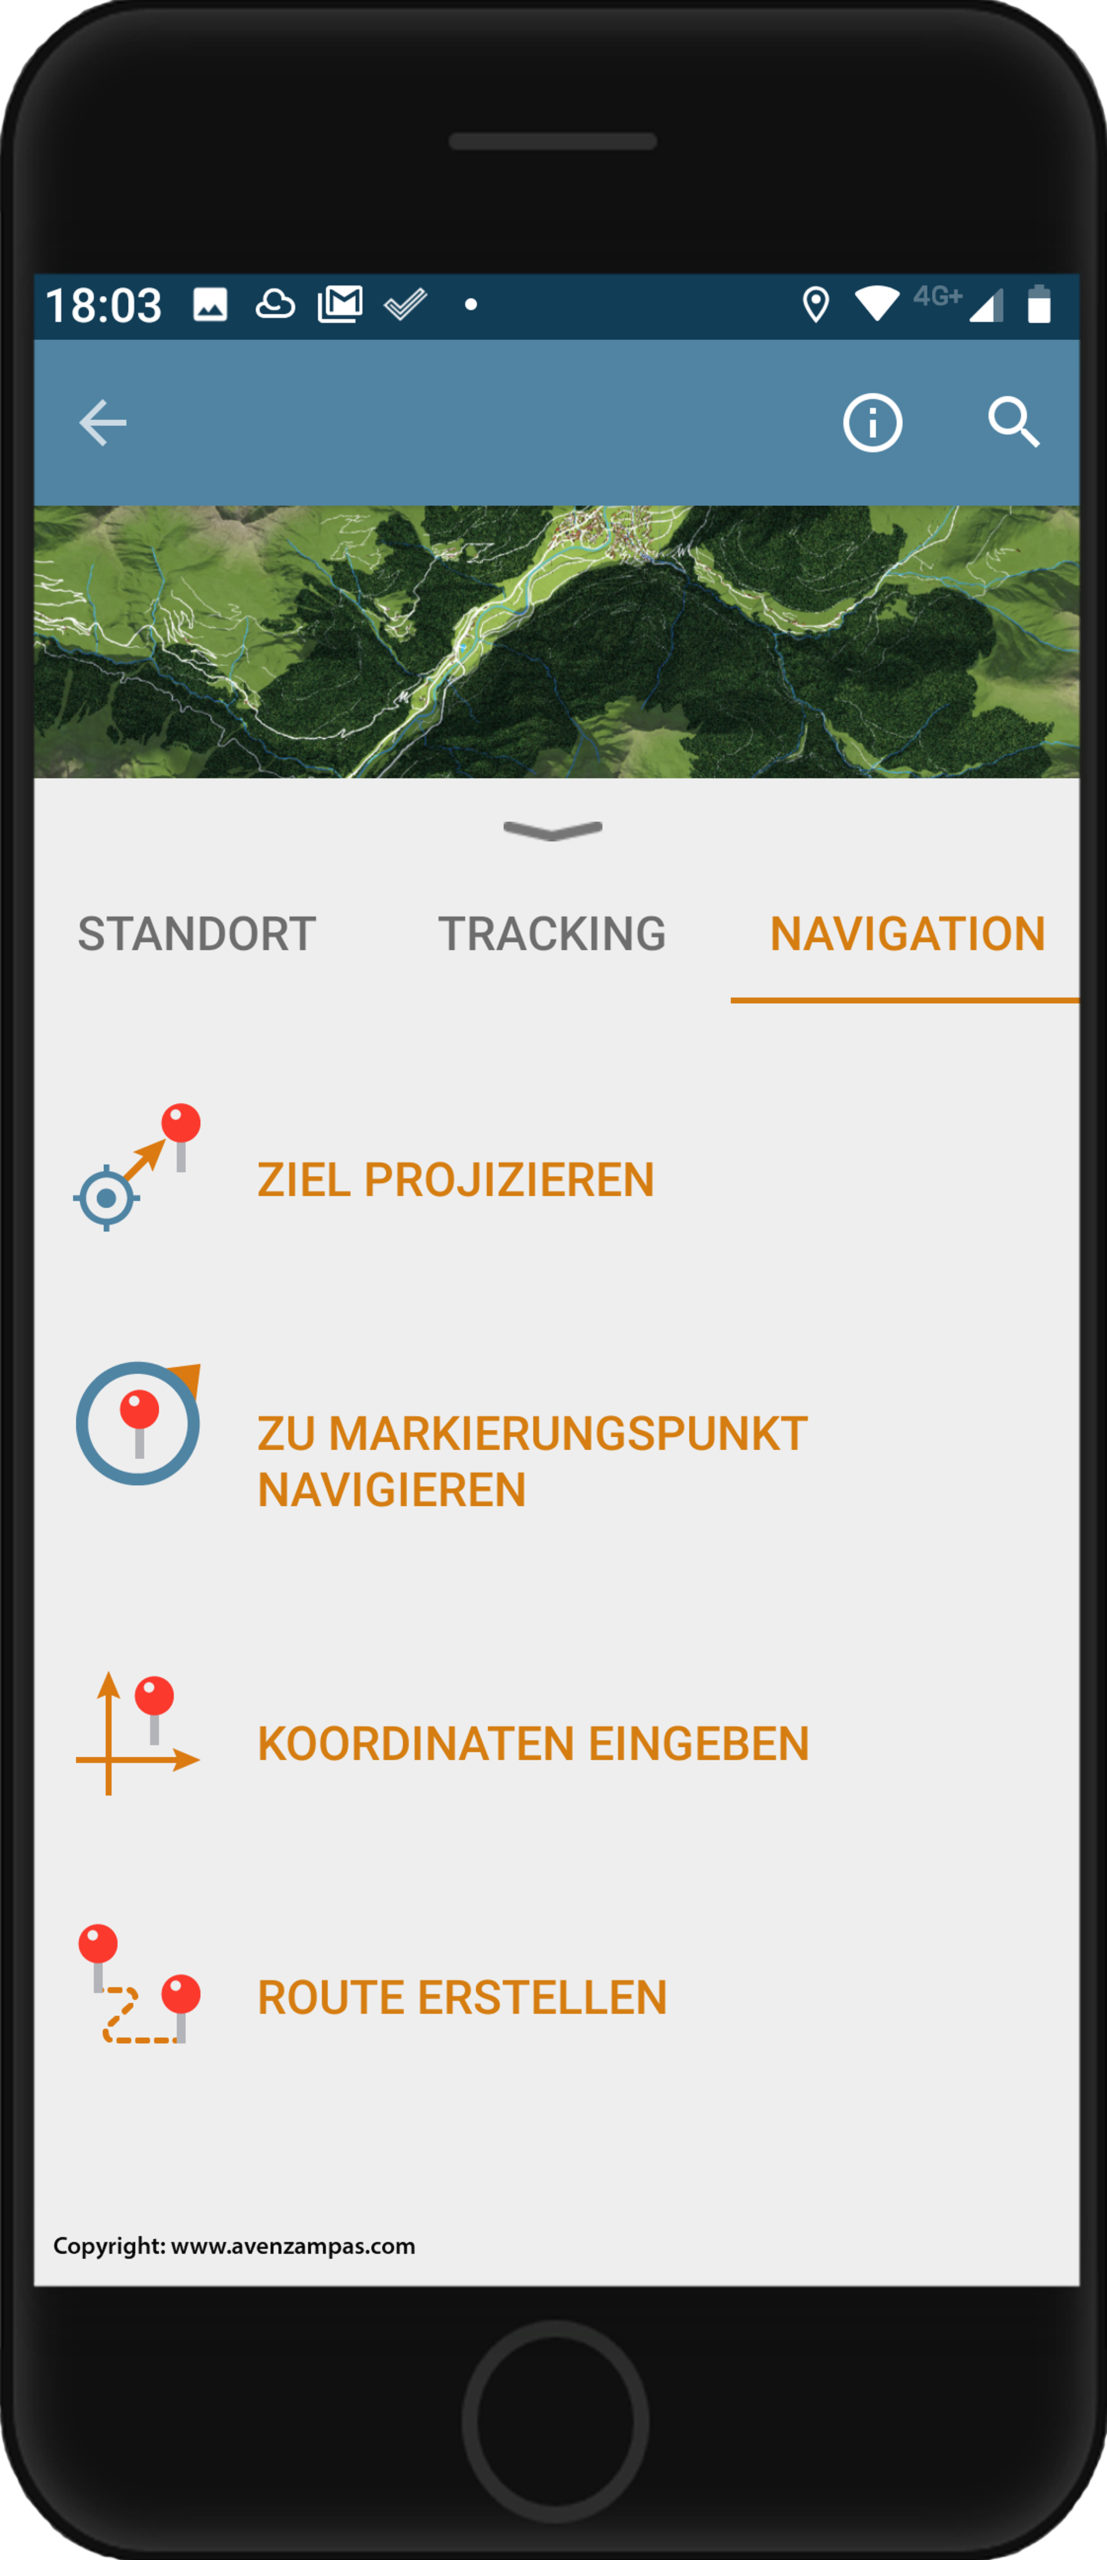 Grundkarte panoMap Smartphone Avenzamaps Navigation Copyright